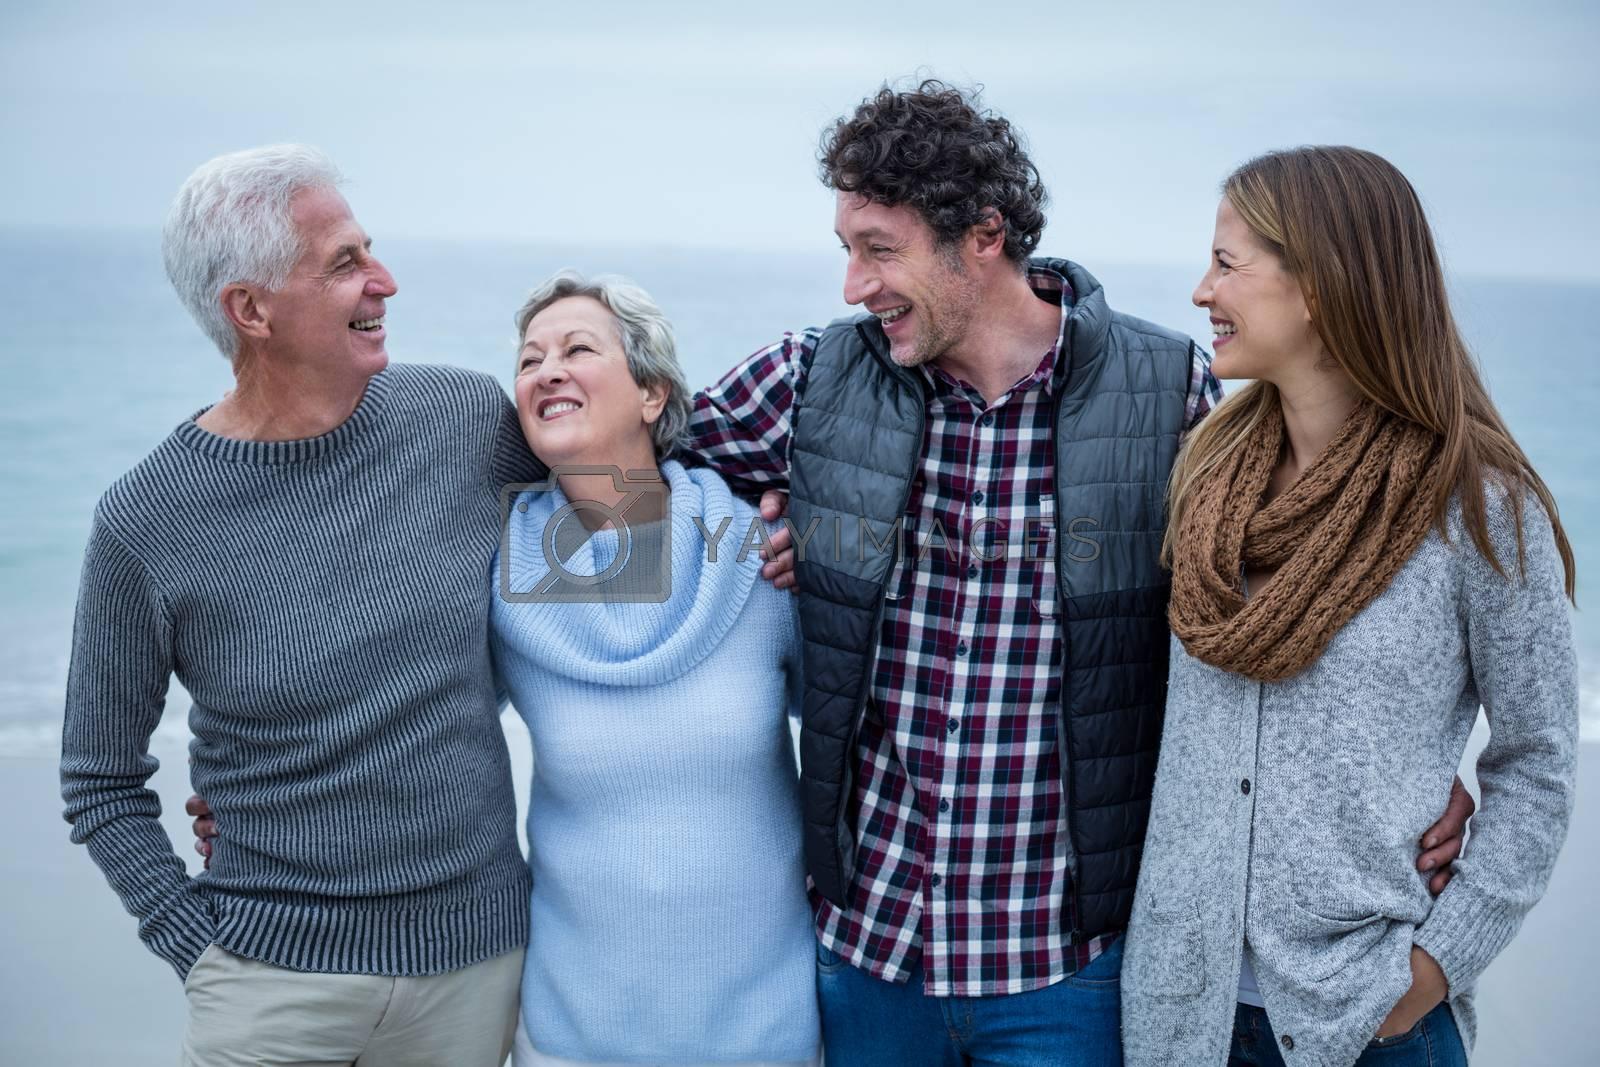 Cheerful family enjoying on shore at beach